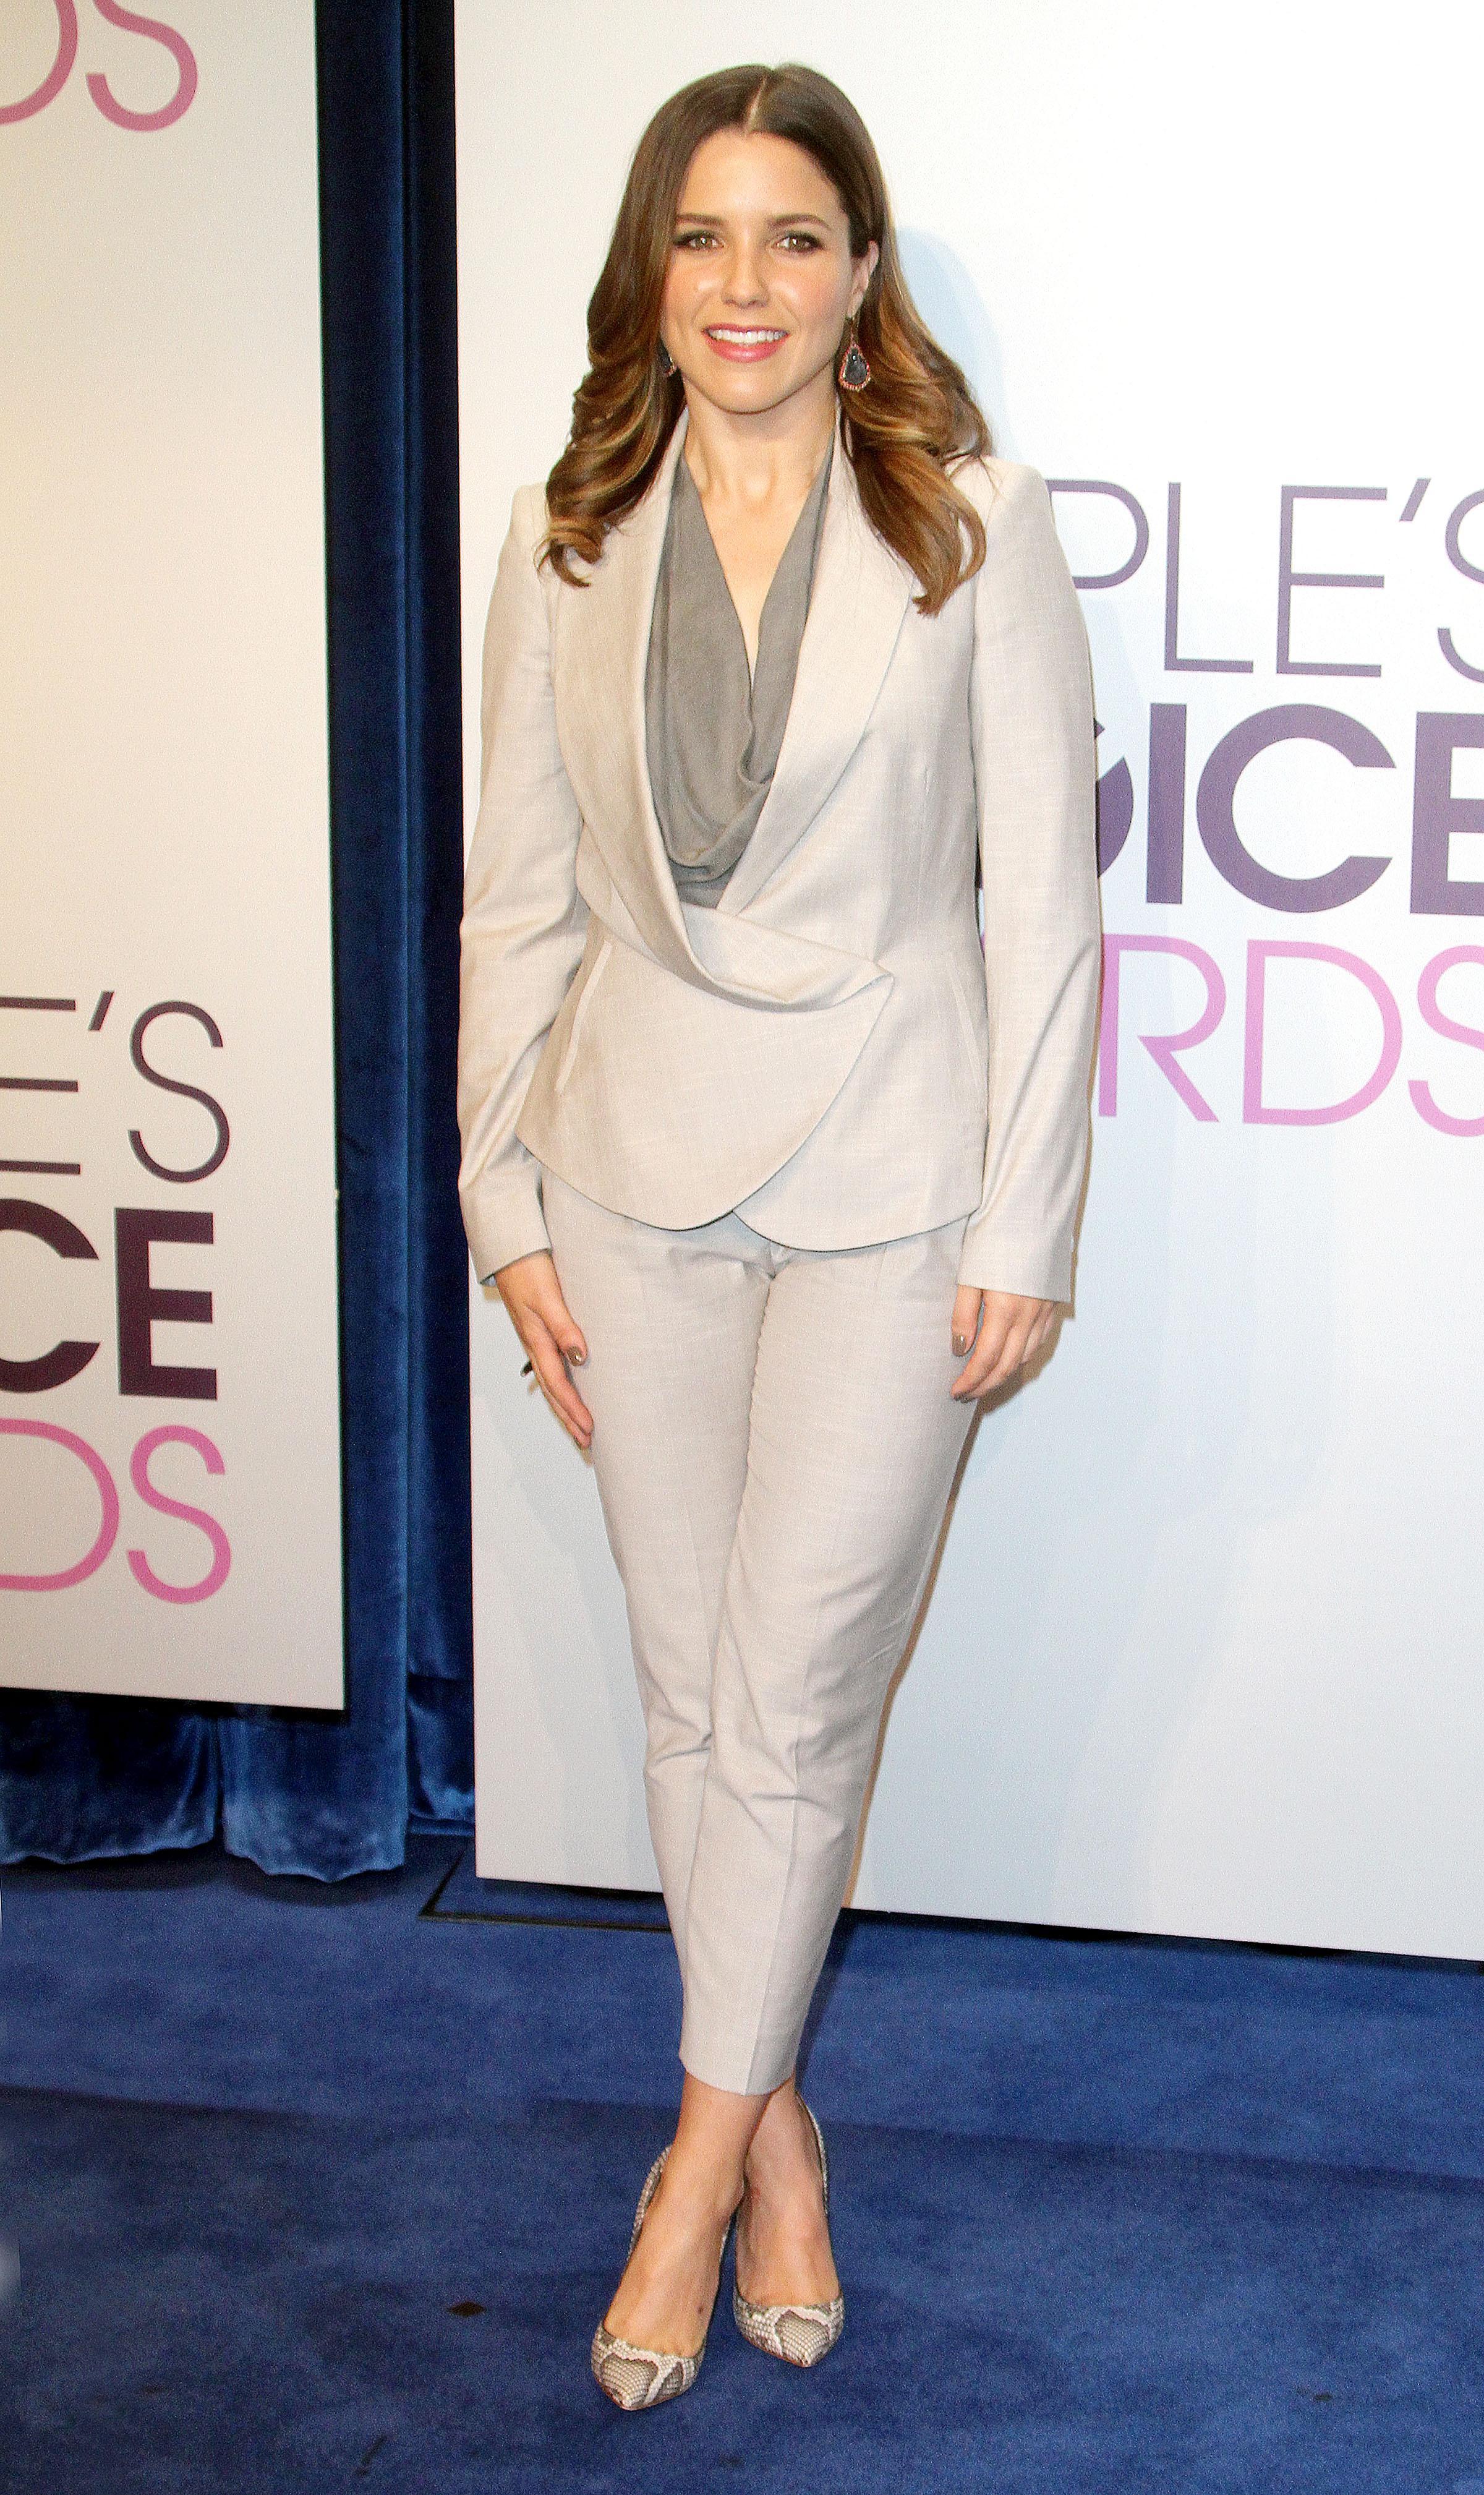 051529748_Sophia_Bush_Peoples_Choice_Awards_Nomination_Announcements2_122_542lo.jpg